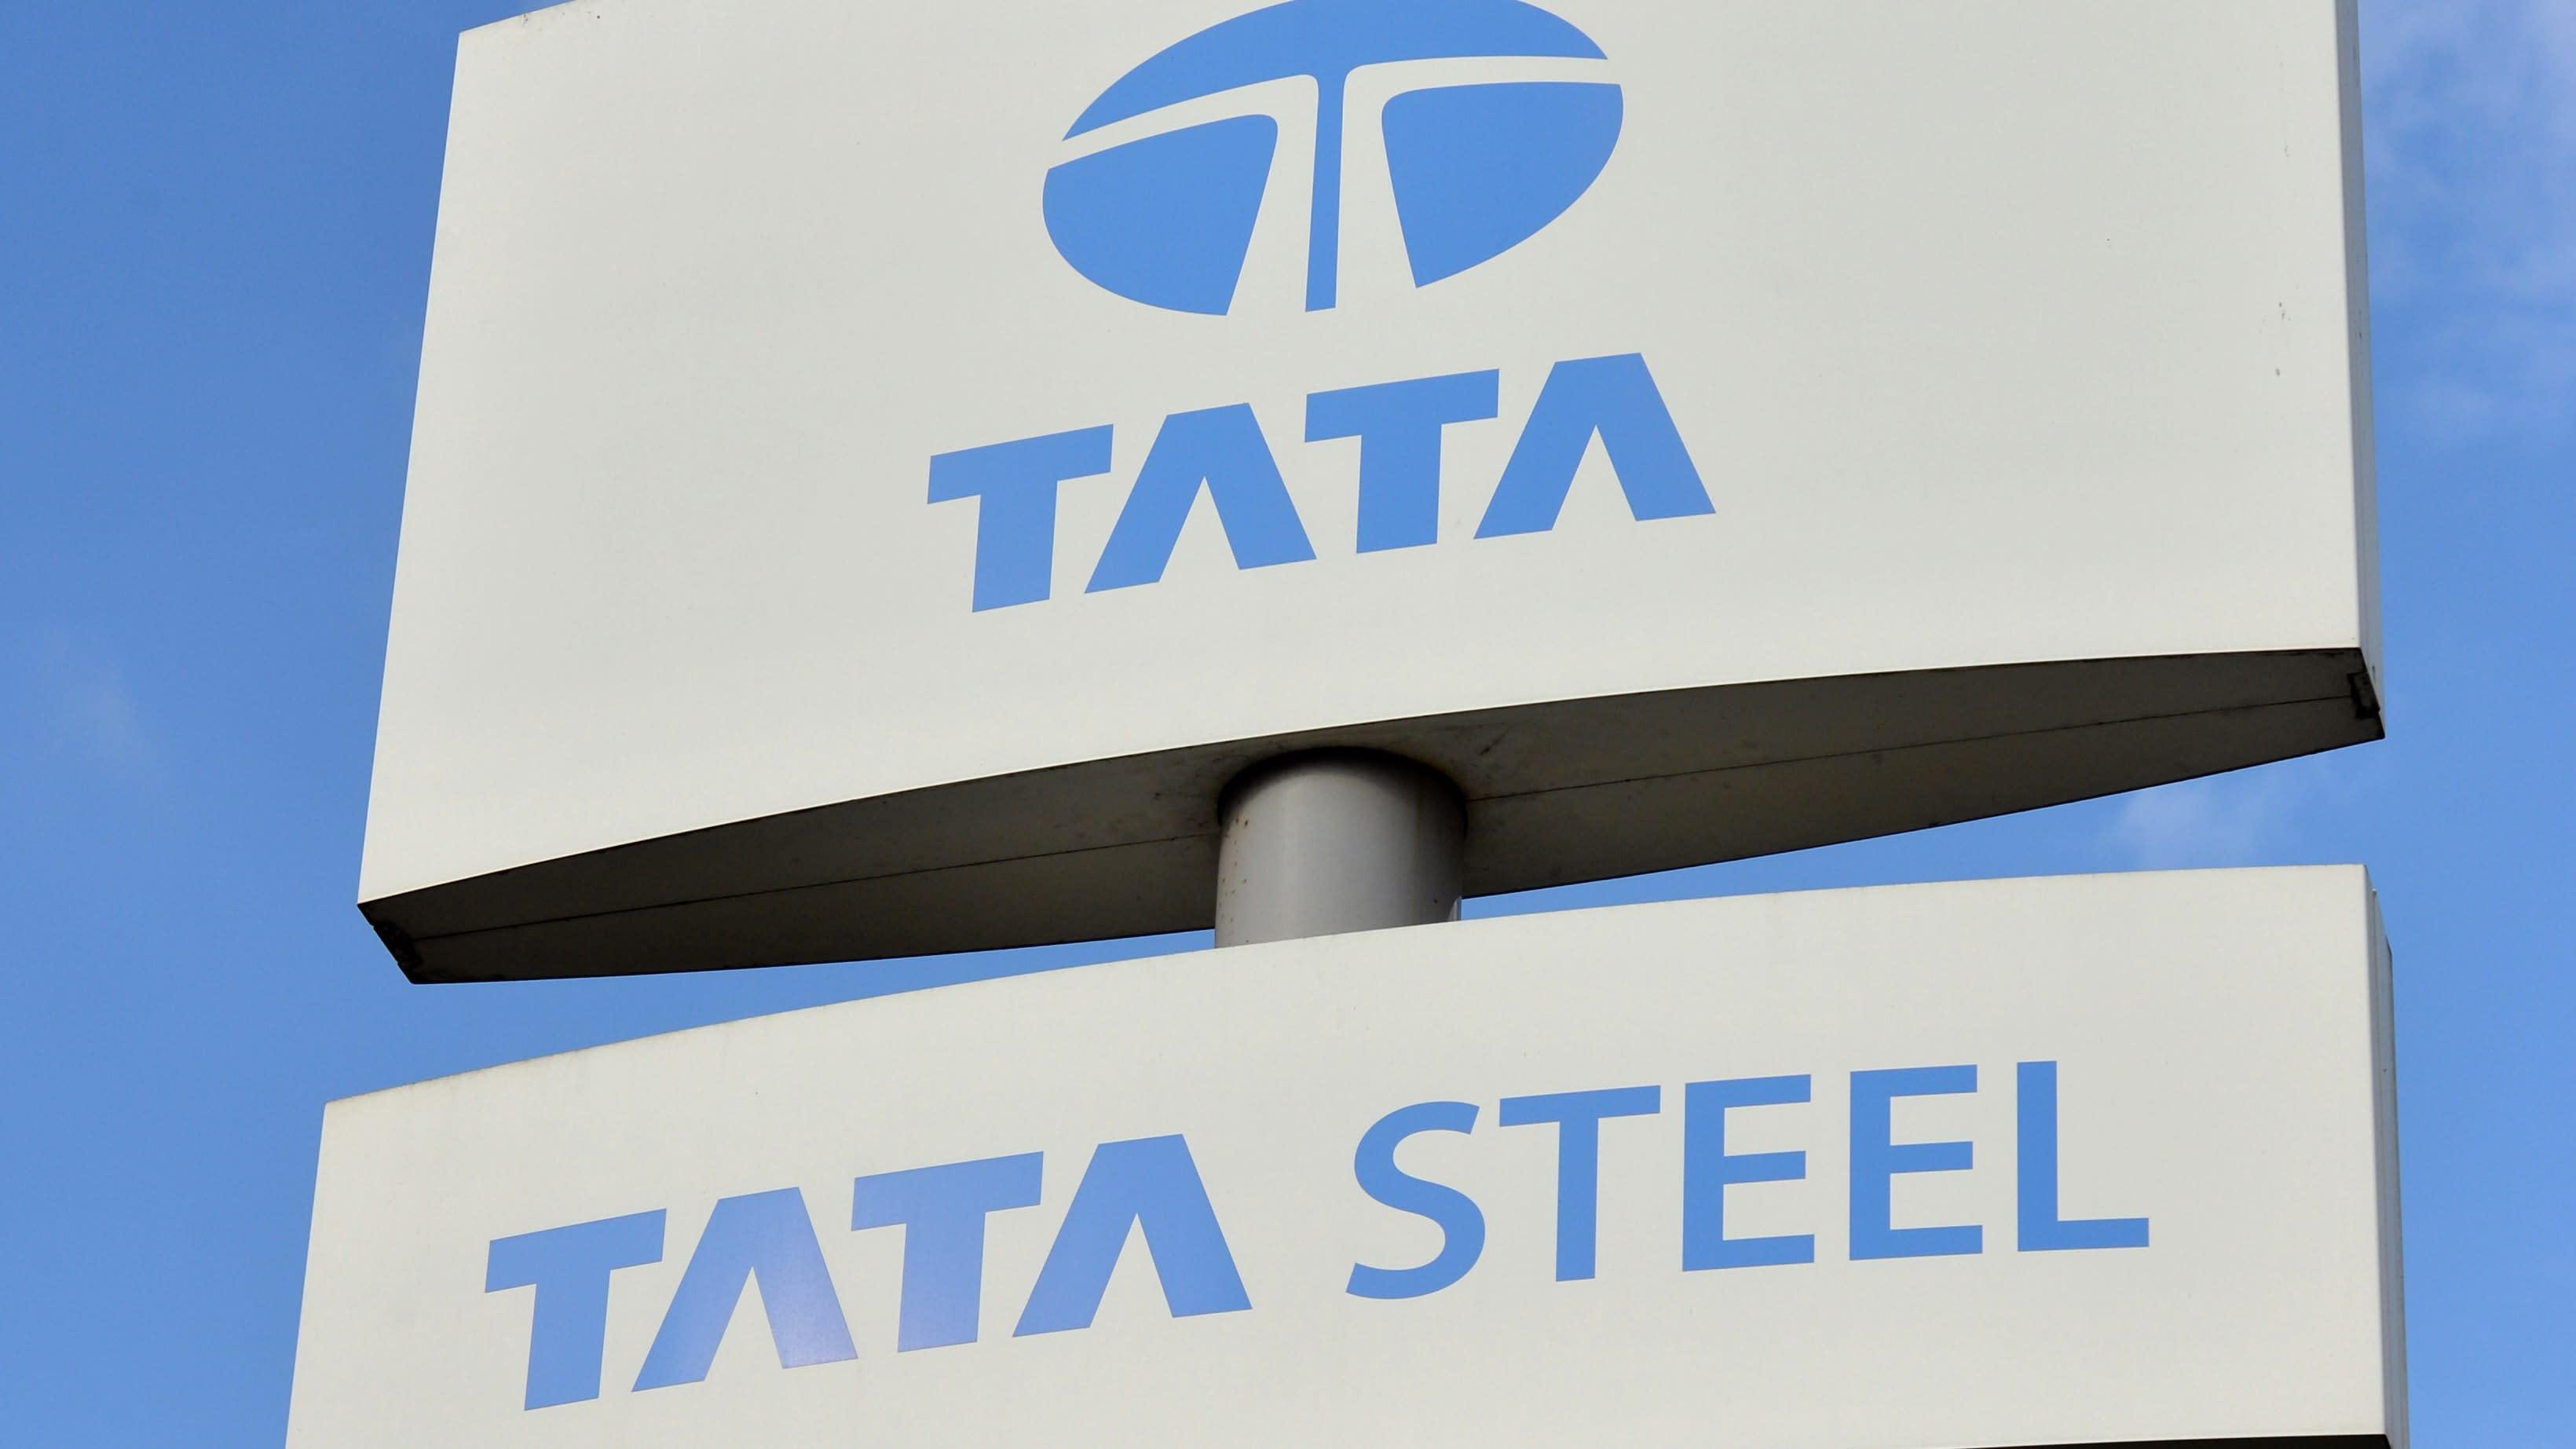 Tata Steel plans to cut 3,000 jobs across Europe 'devastating for workforce'